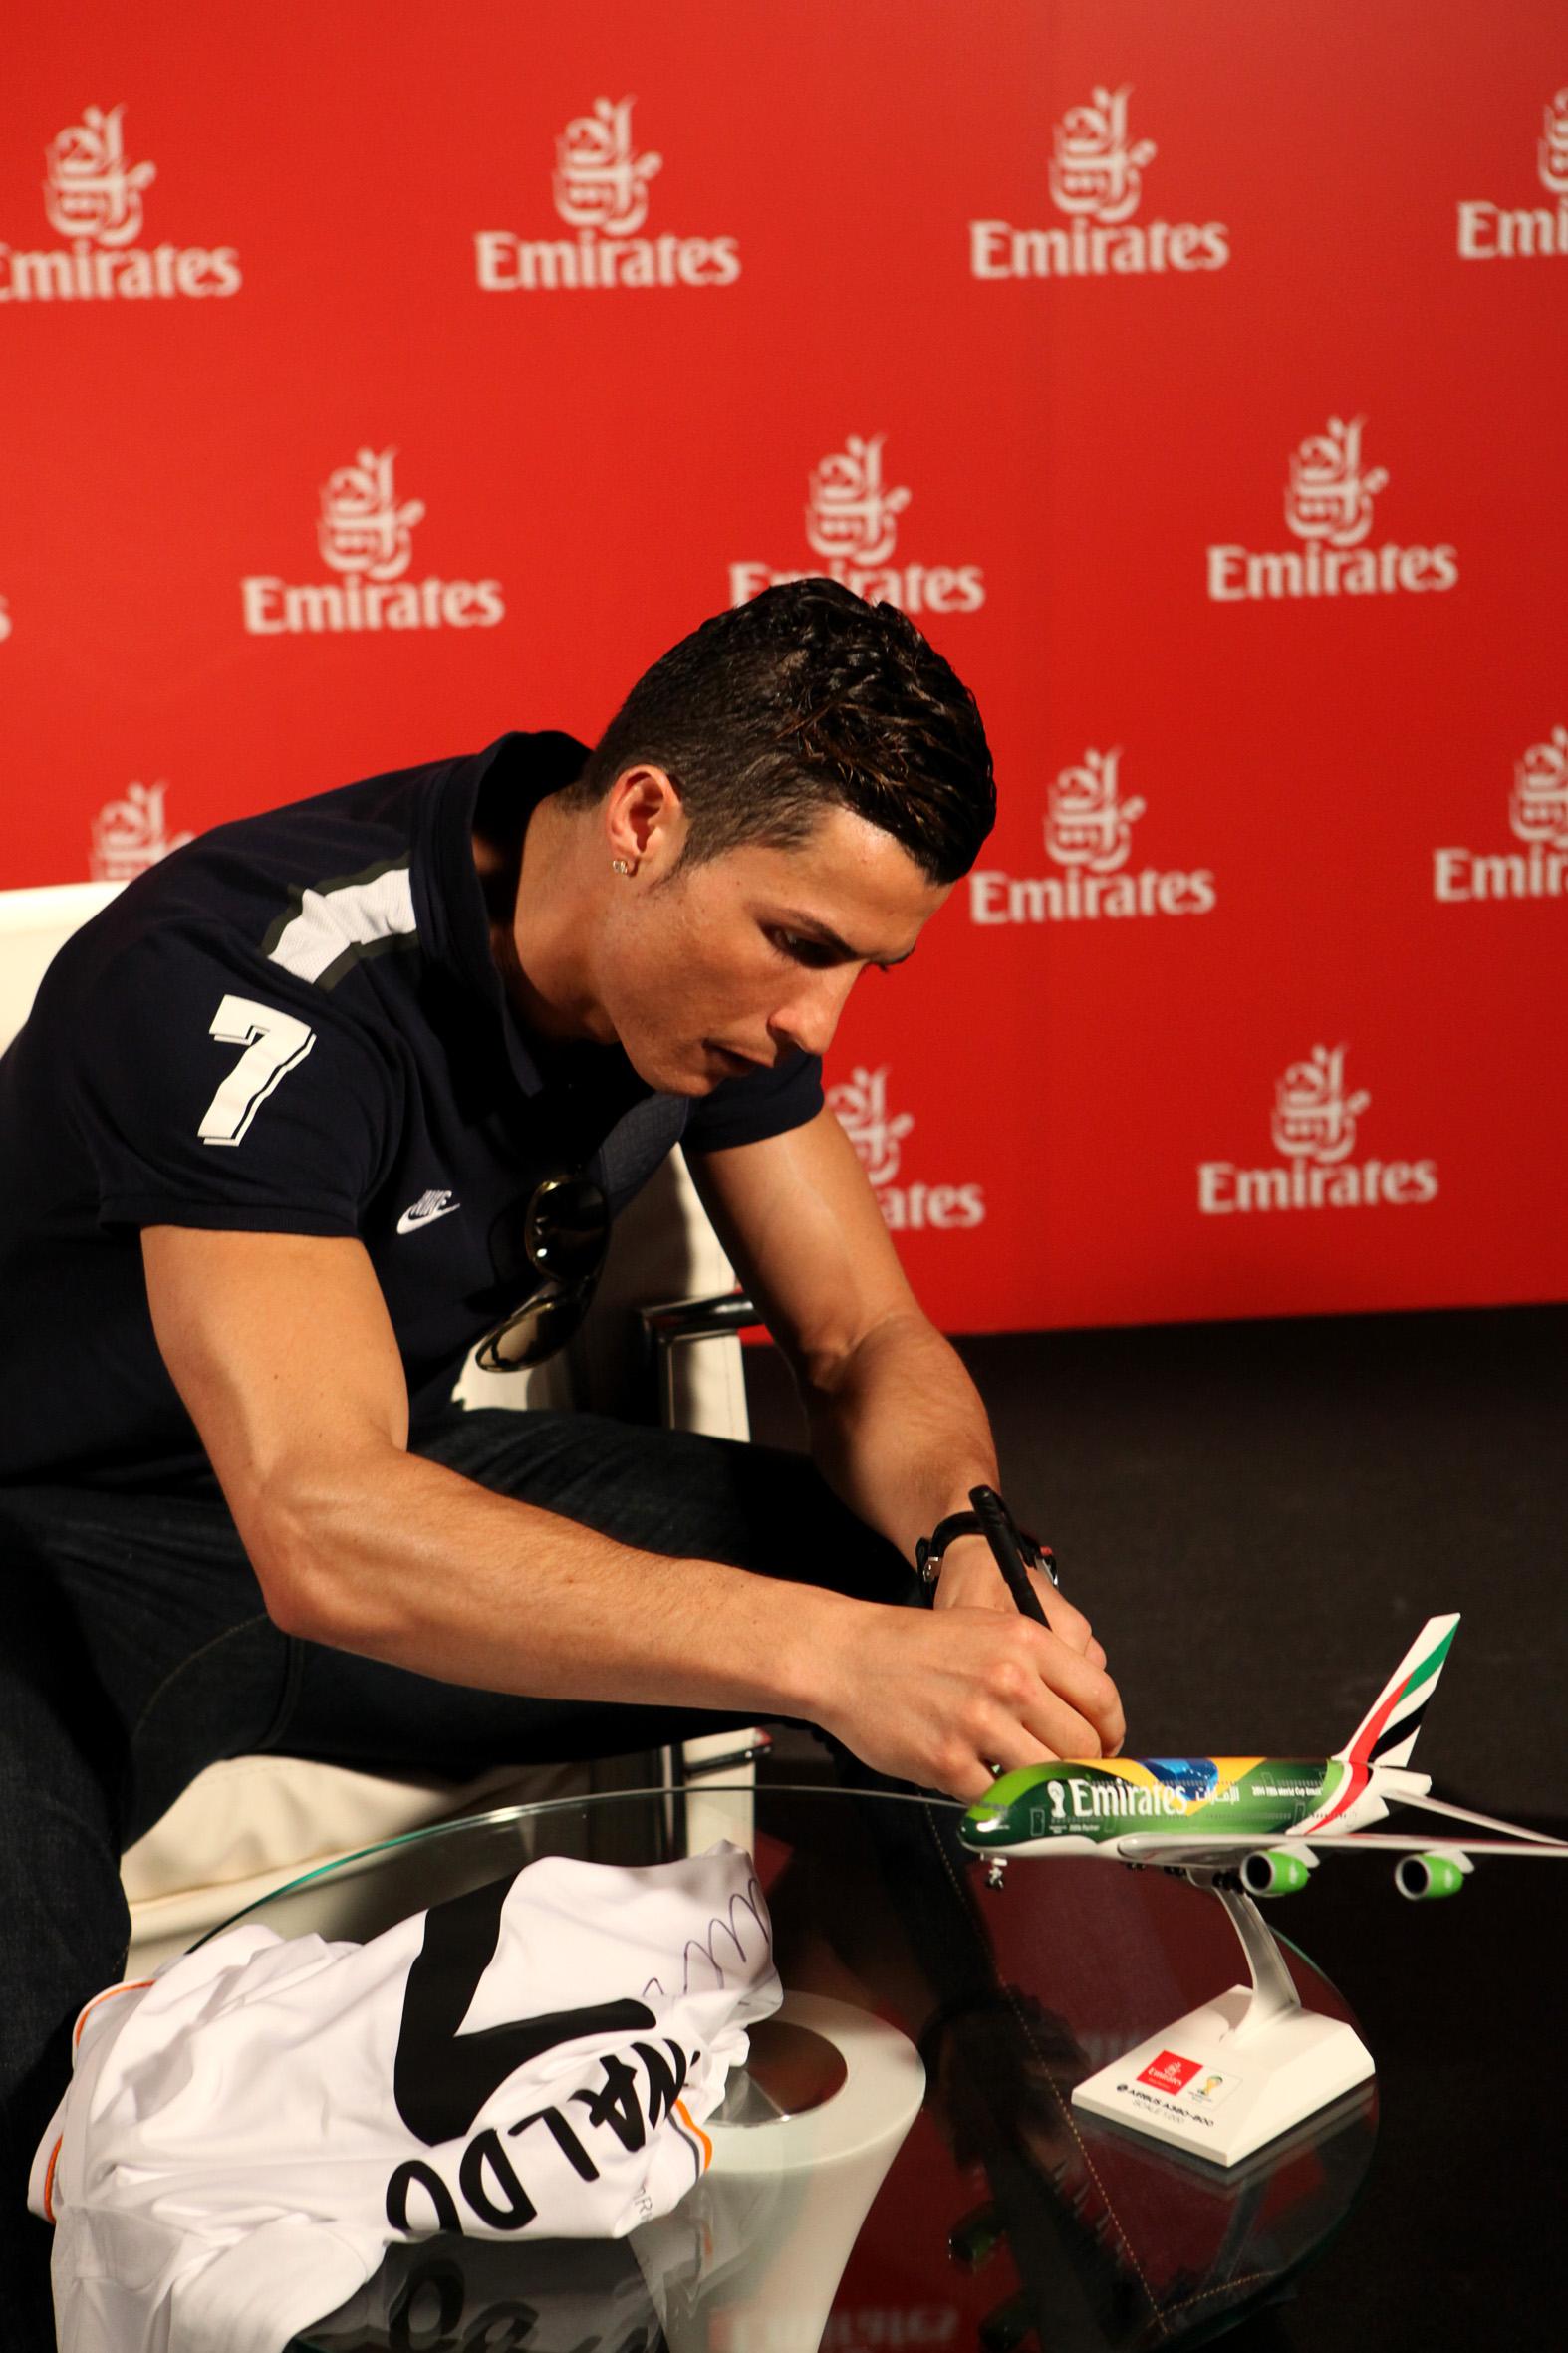 Emirates Cristiano Ronaldo